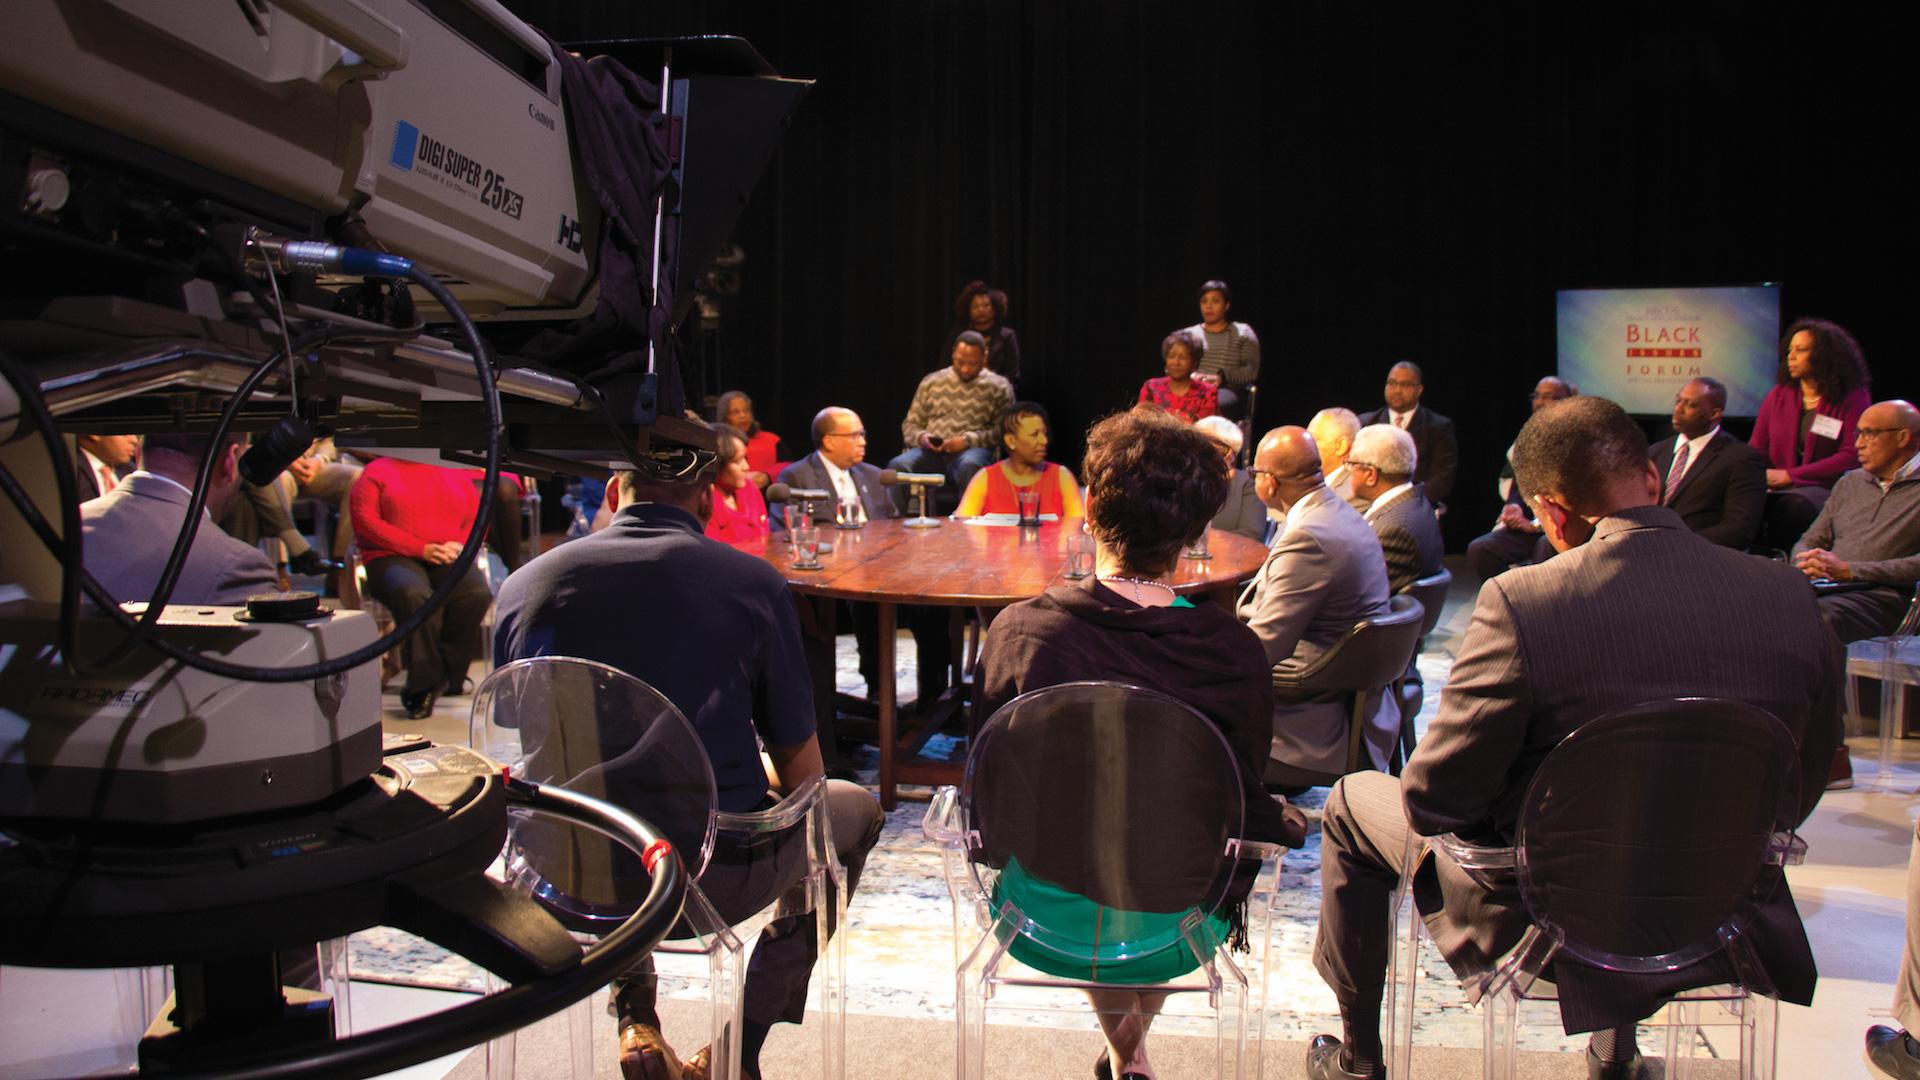 Behind the scenes: HBCU Legacy and Leadership